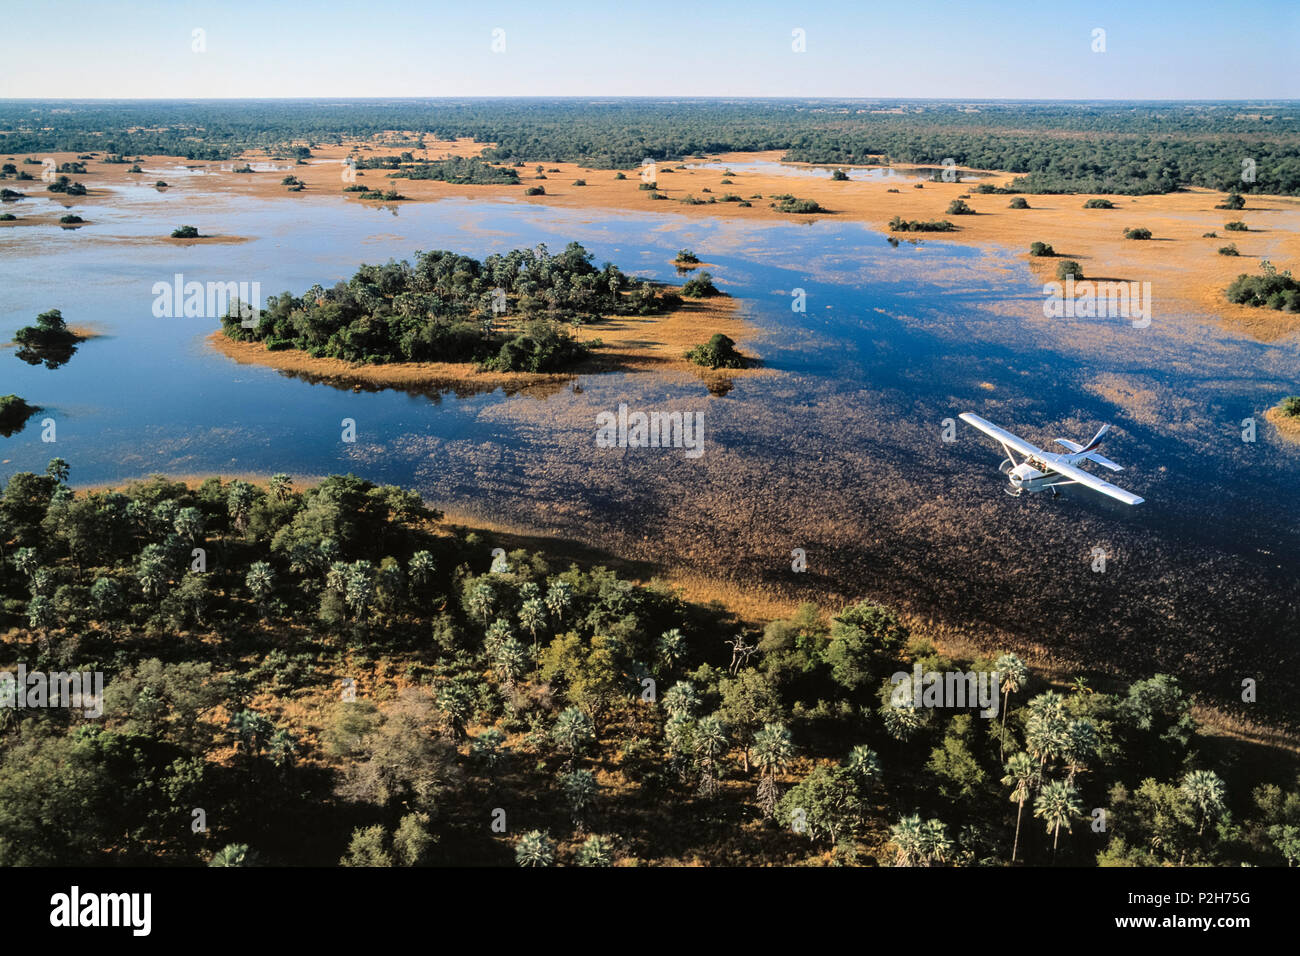 Flight Safari, Okavango-Delta, Botswana, Africa Stock Photo